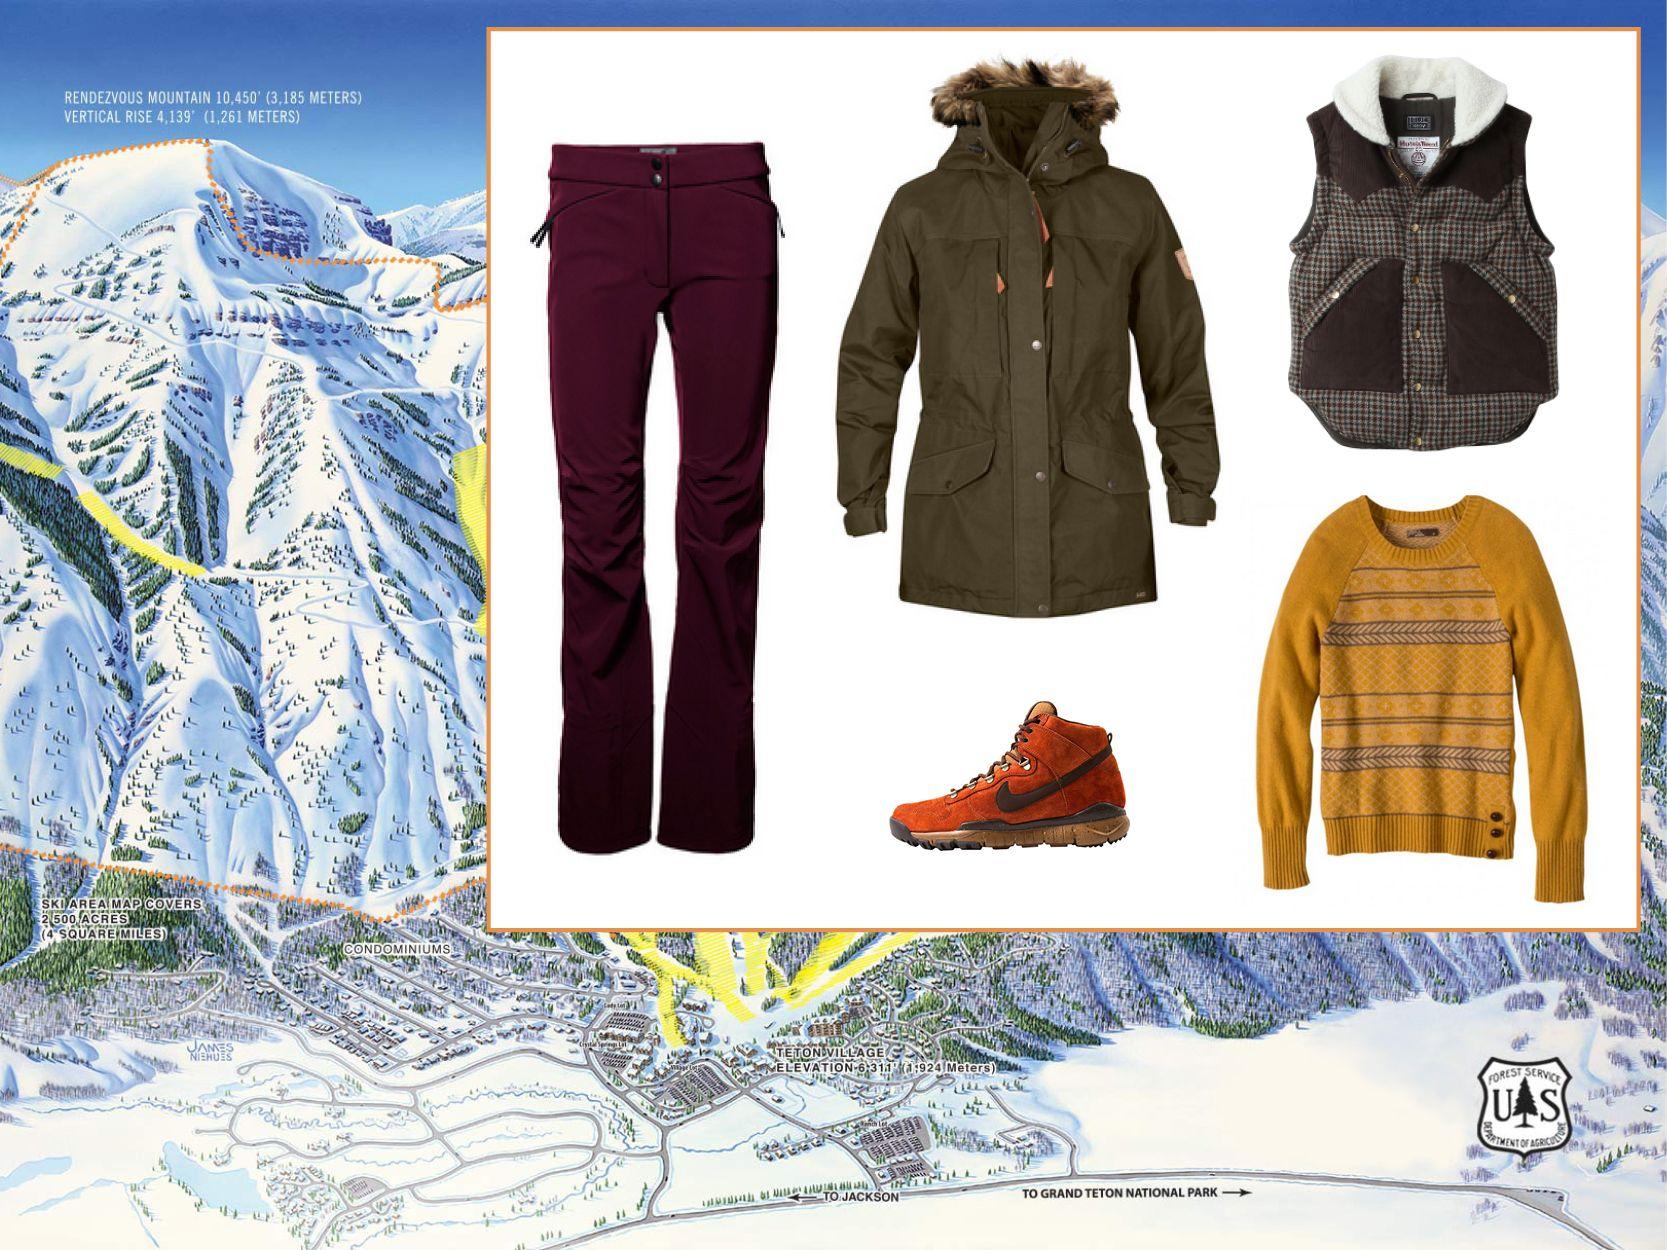 Look Chic On The Slopes The Best Ski Style From Aspen To Zermatt Ski Fashion Best Skis Winter Jackets